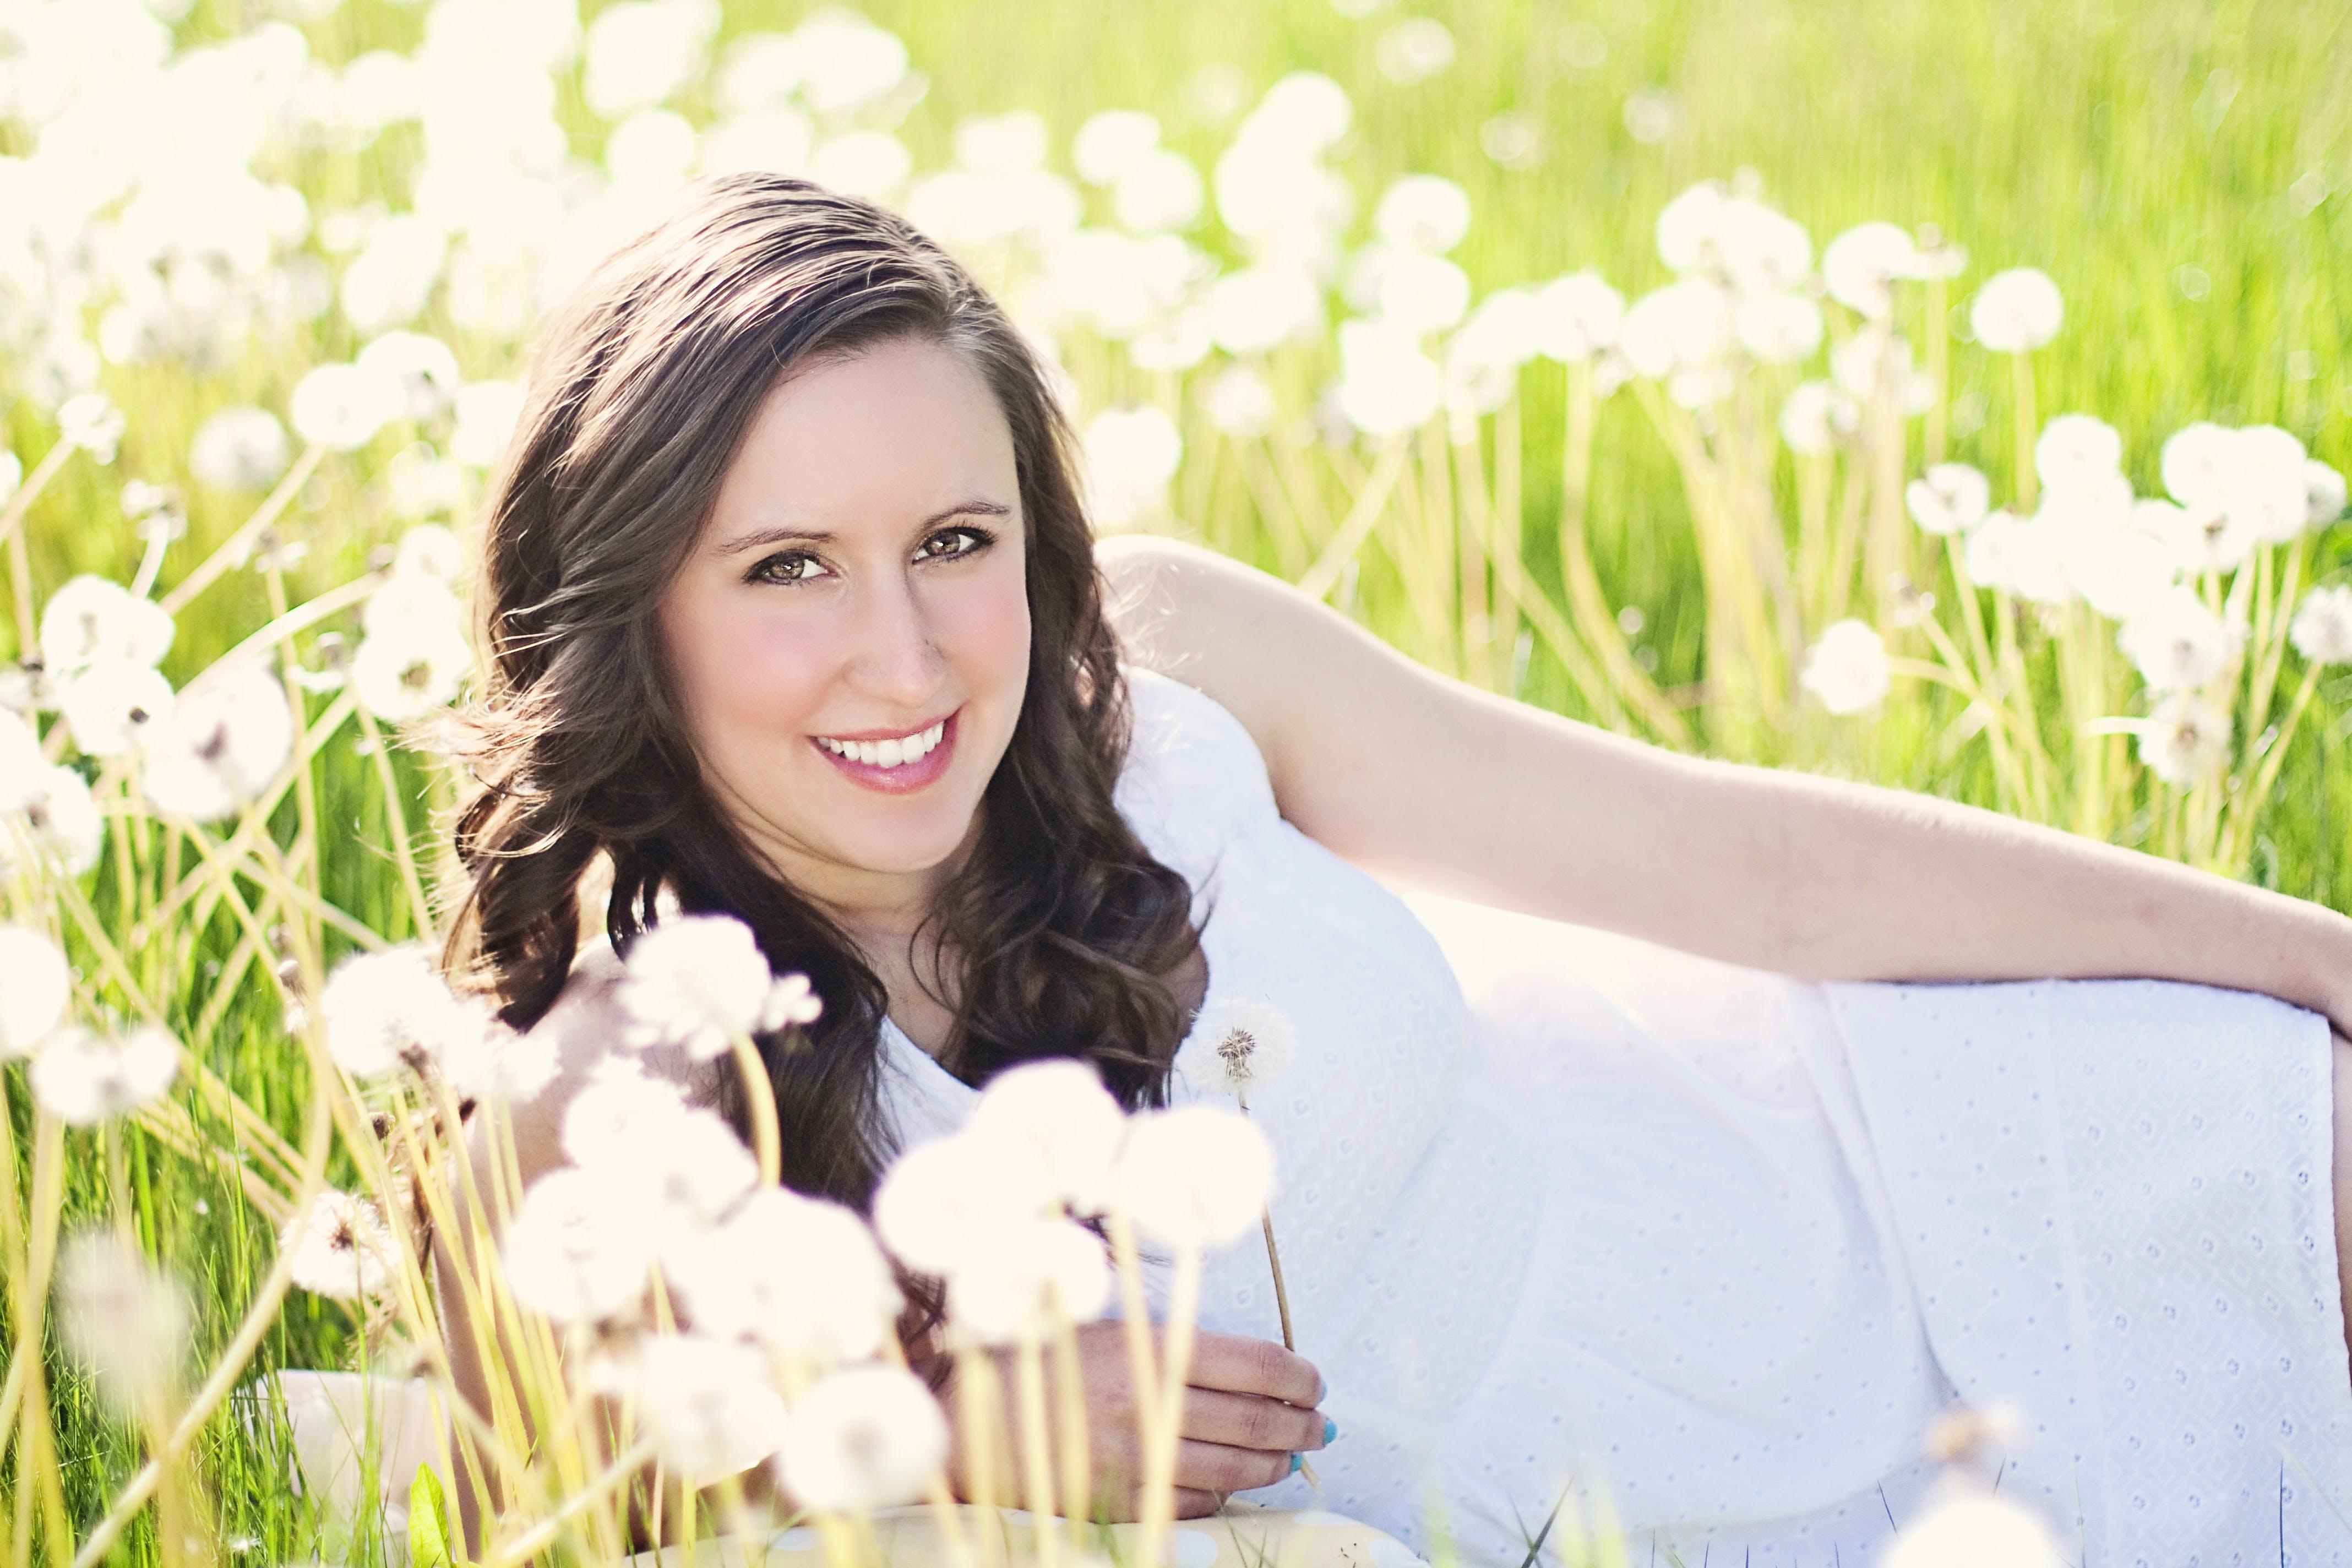 Woman in White Sleeveless Dress Lying on Green Grass Field